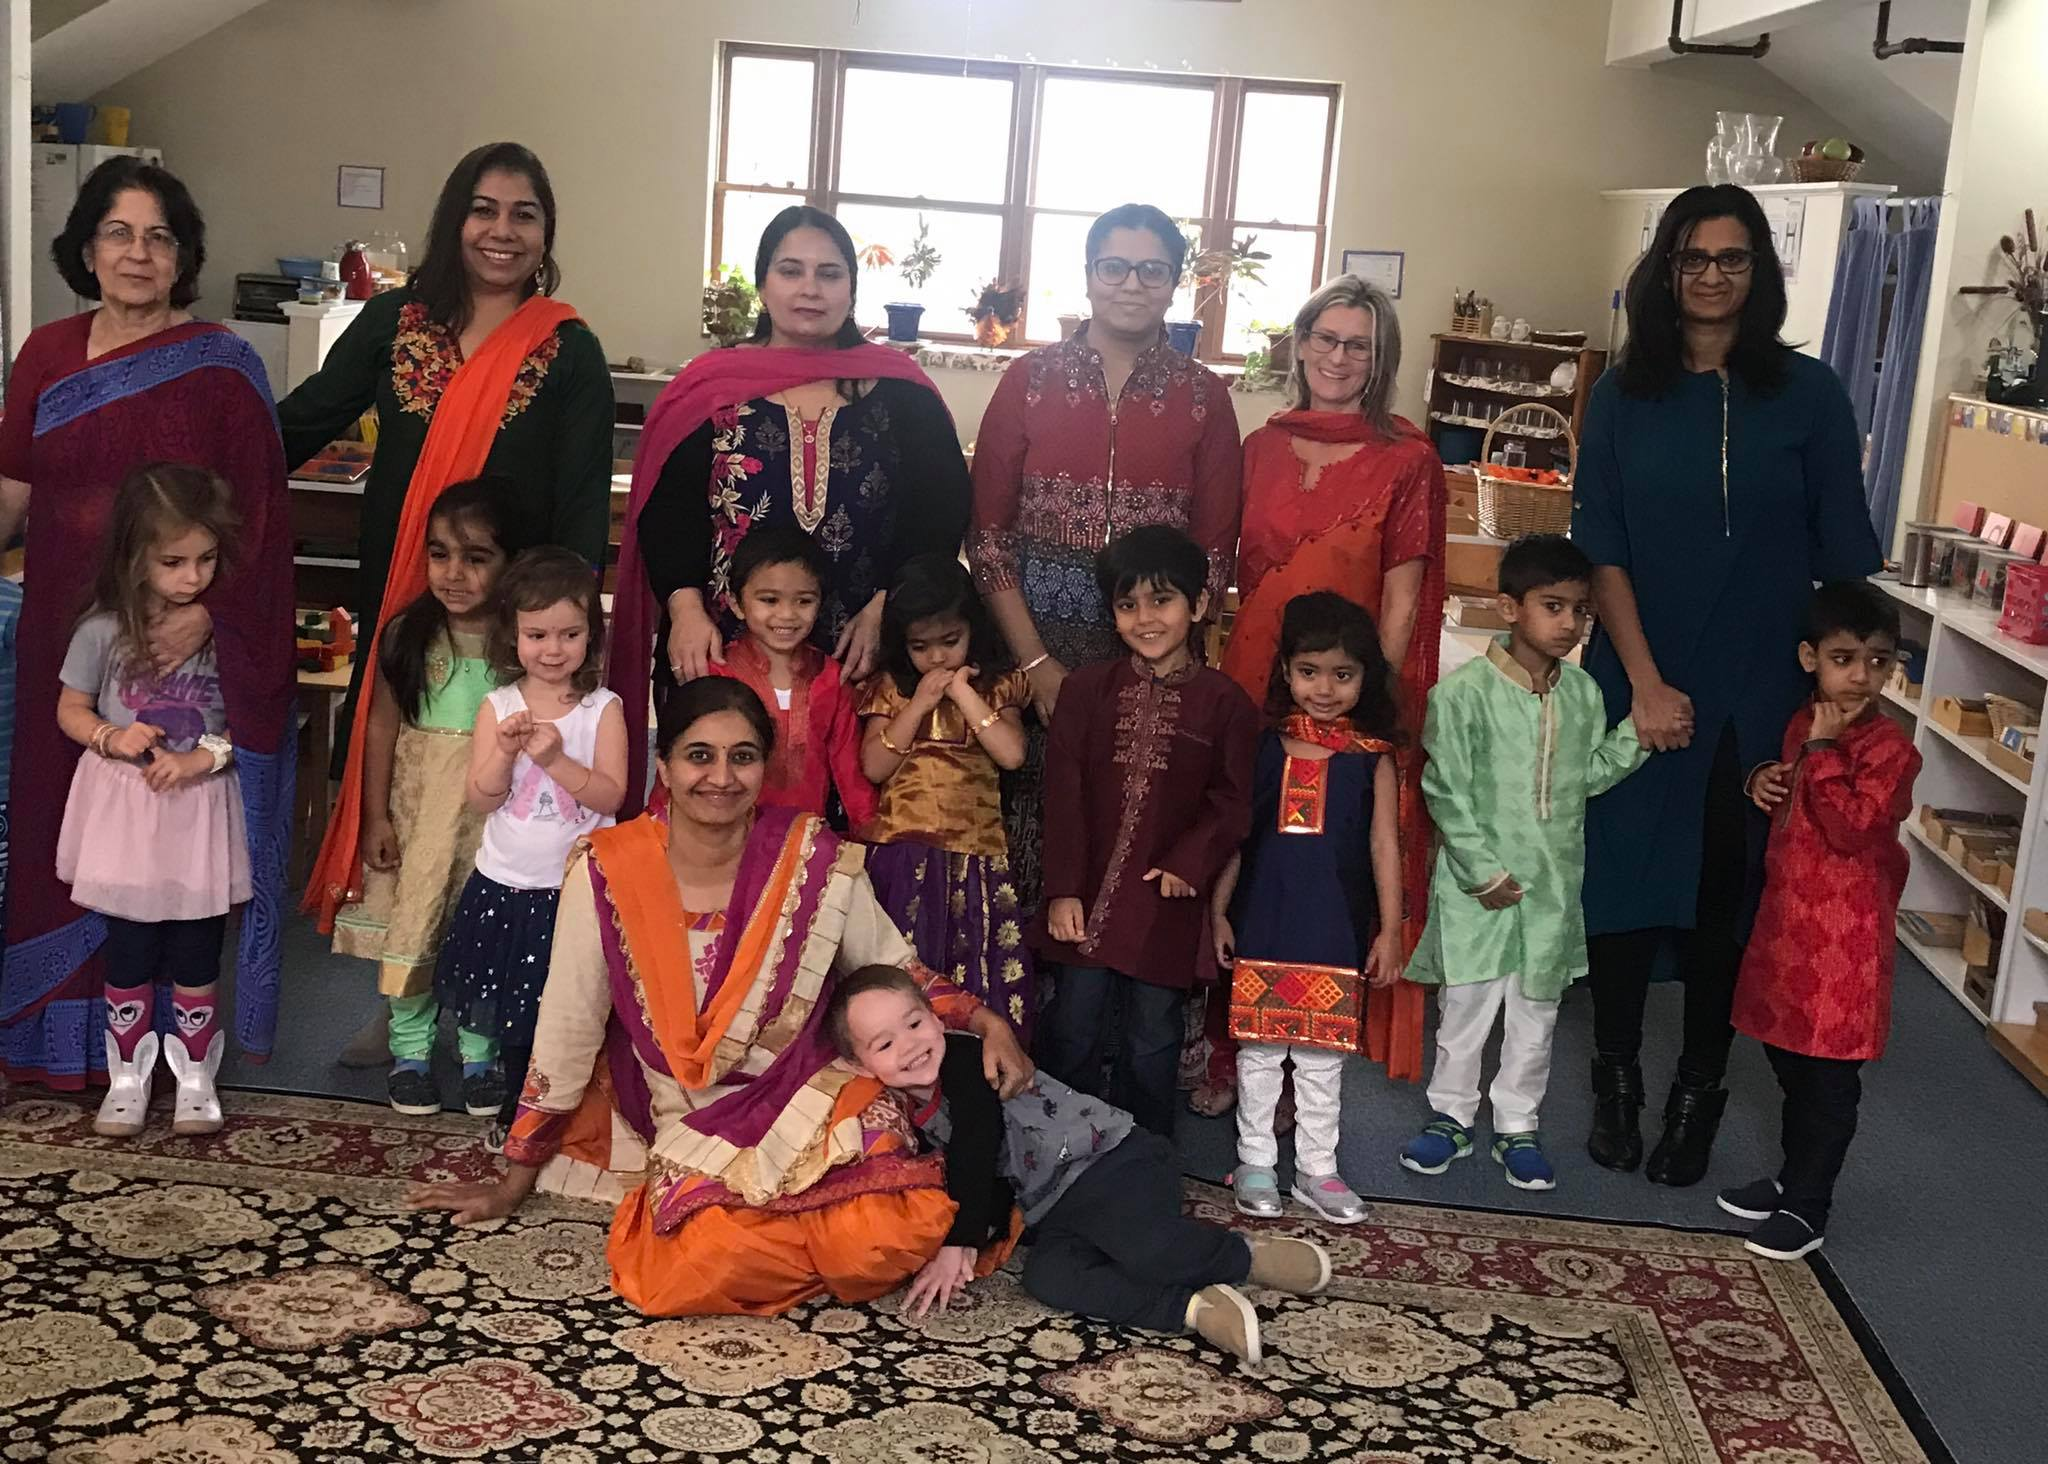 Rosehill_Montessori_Preschool_Kindergarten_classroom_classmates_diversity_diwali.jpg